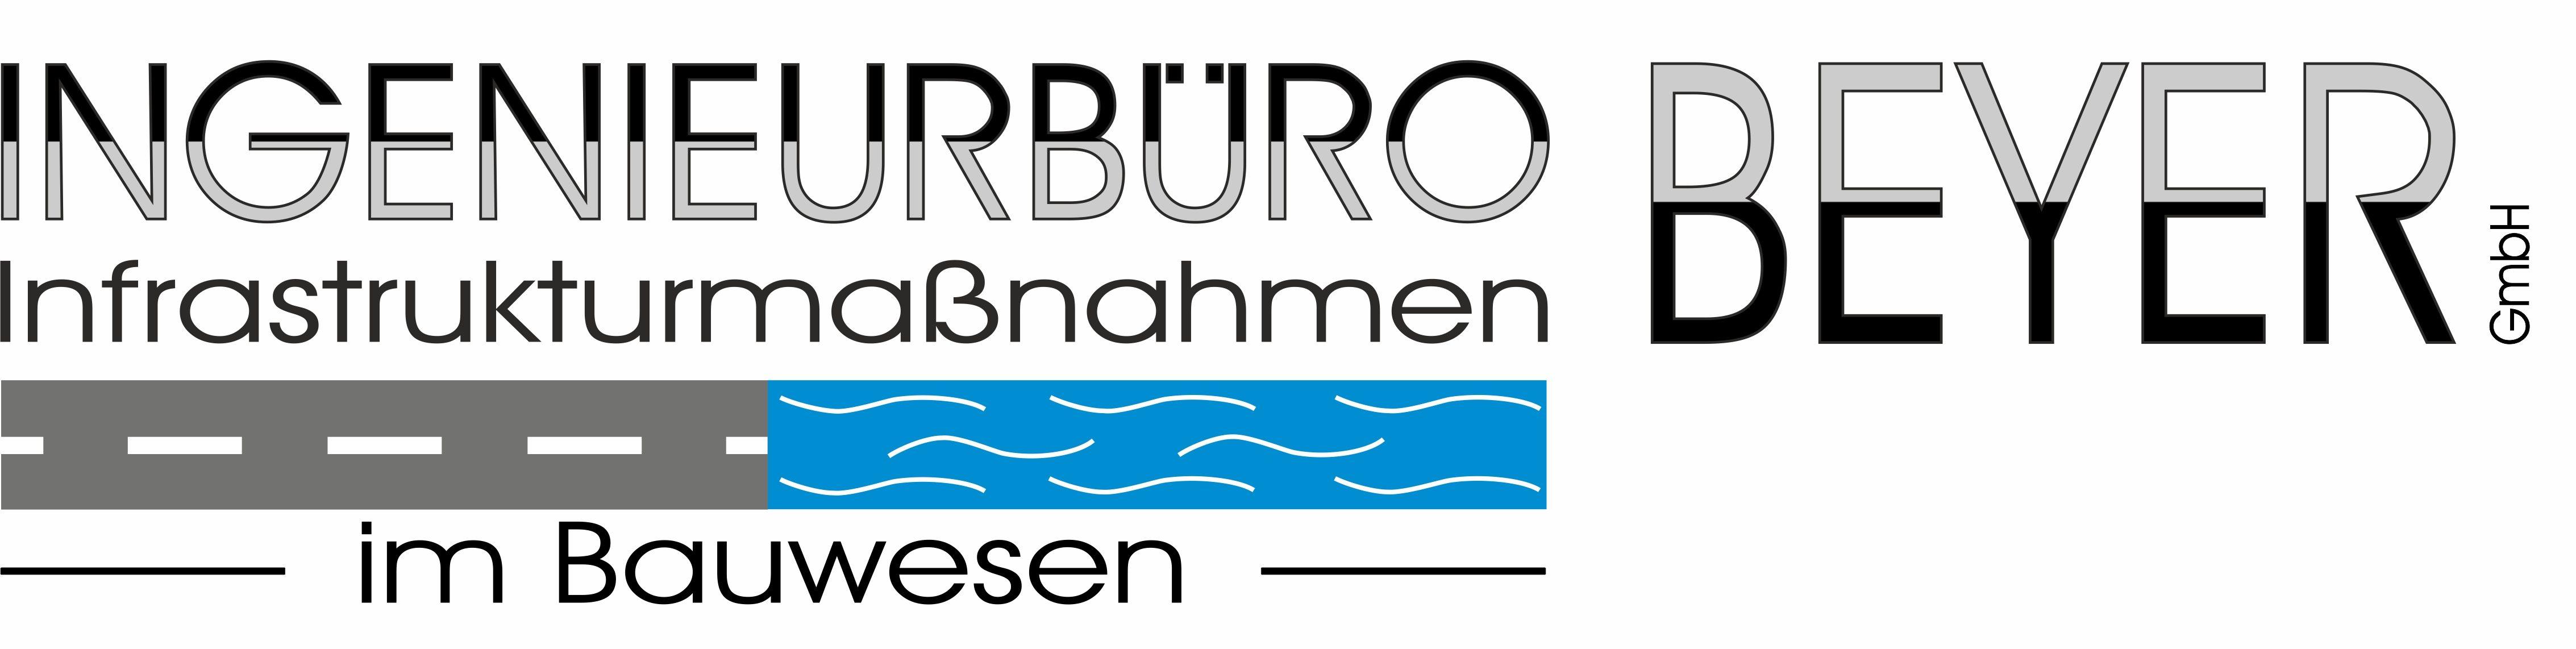 Ingenieurbüro Beyer GmbH